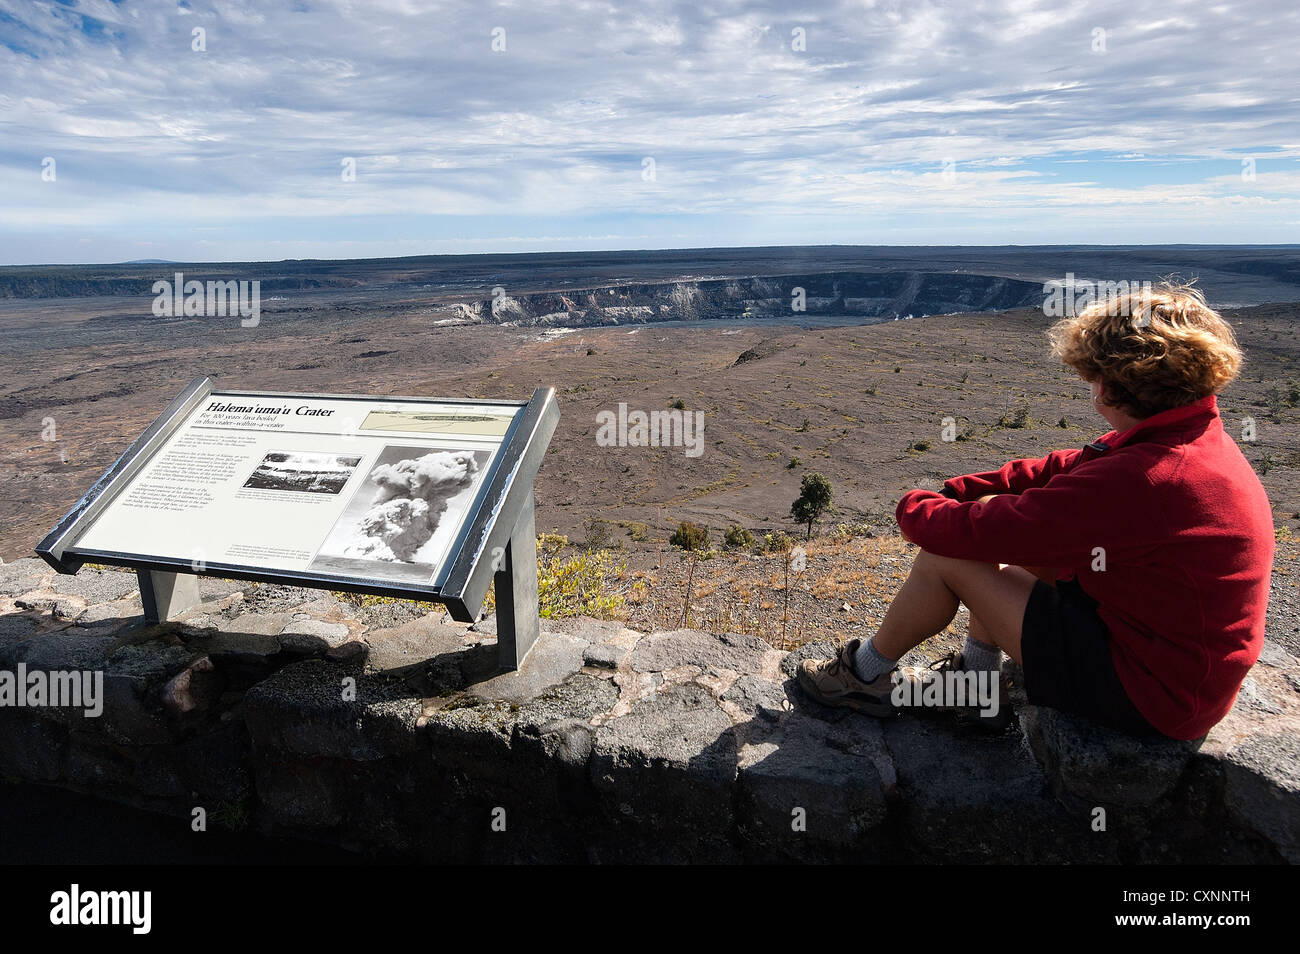 Elk284-2303 Hawaii, Big Island, Volcanoes National Park, Halema'uma'u Crater with woman visitor - Stock Image